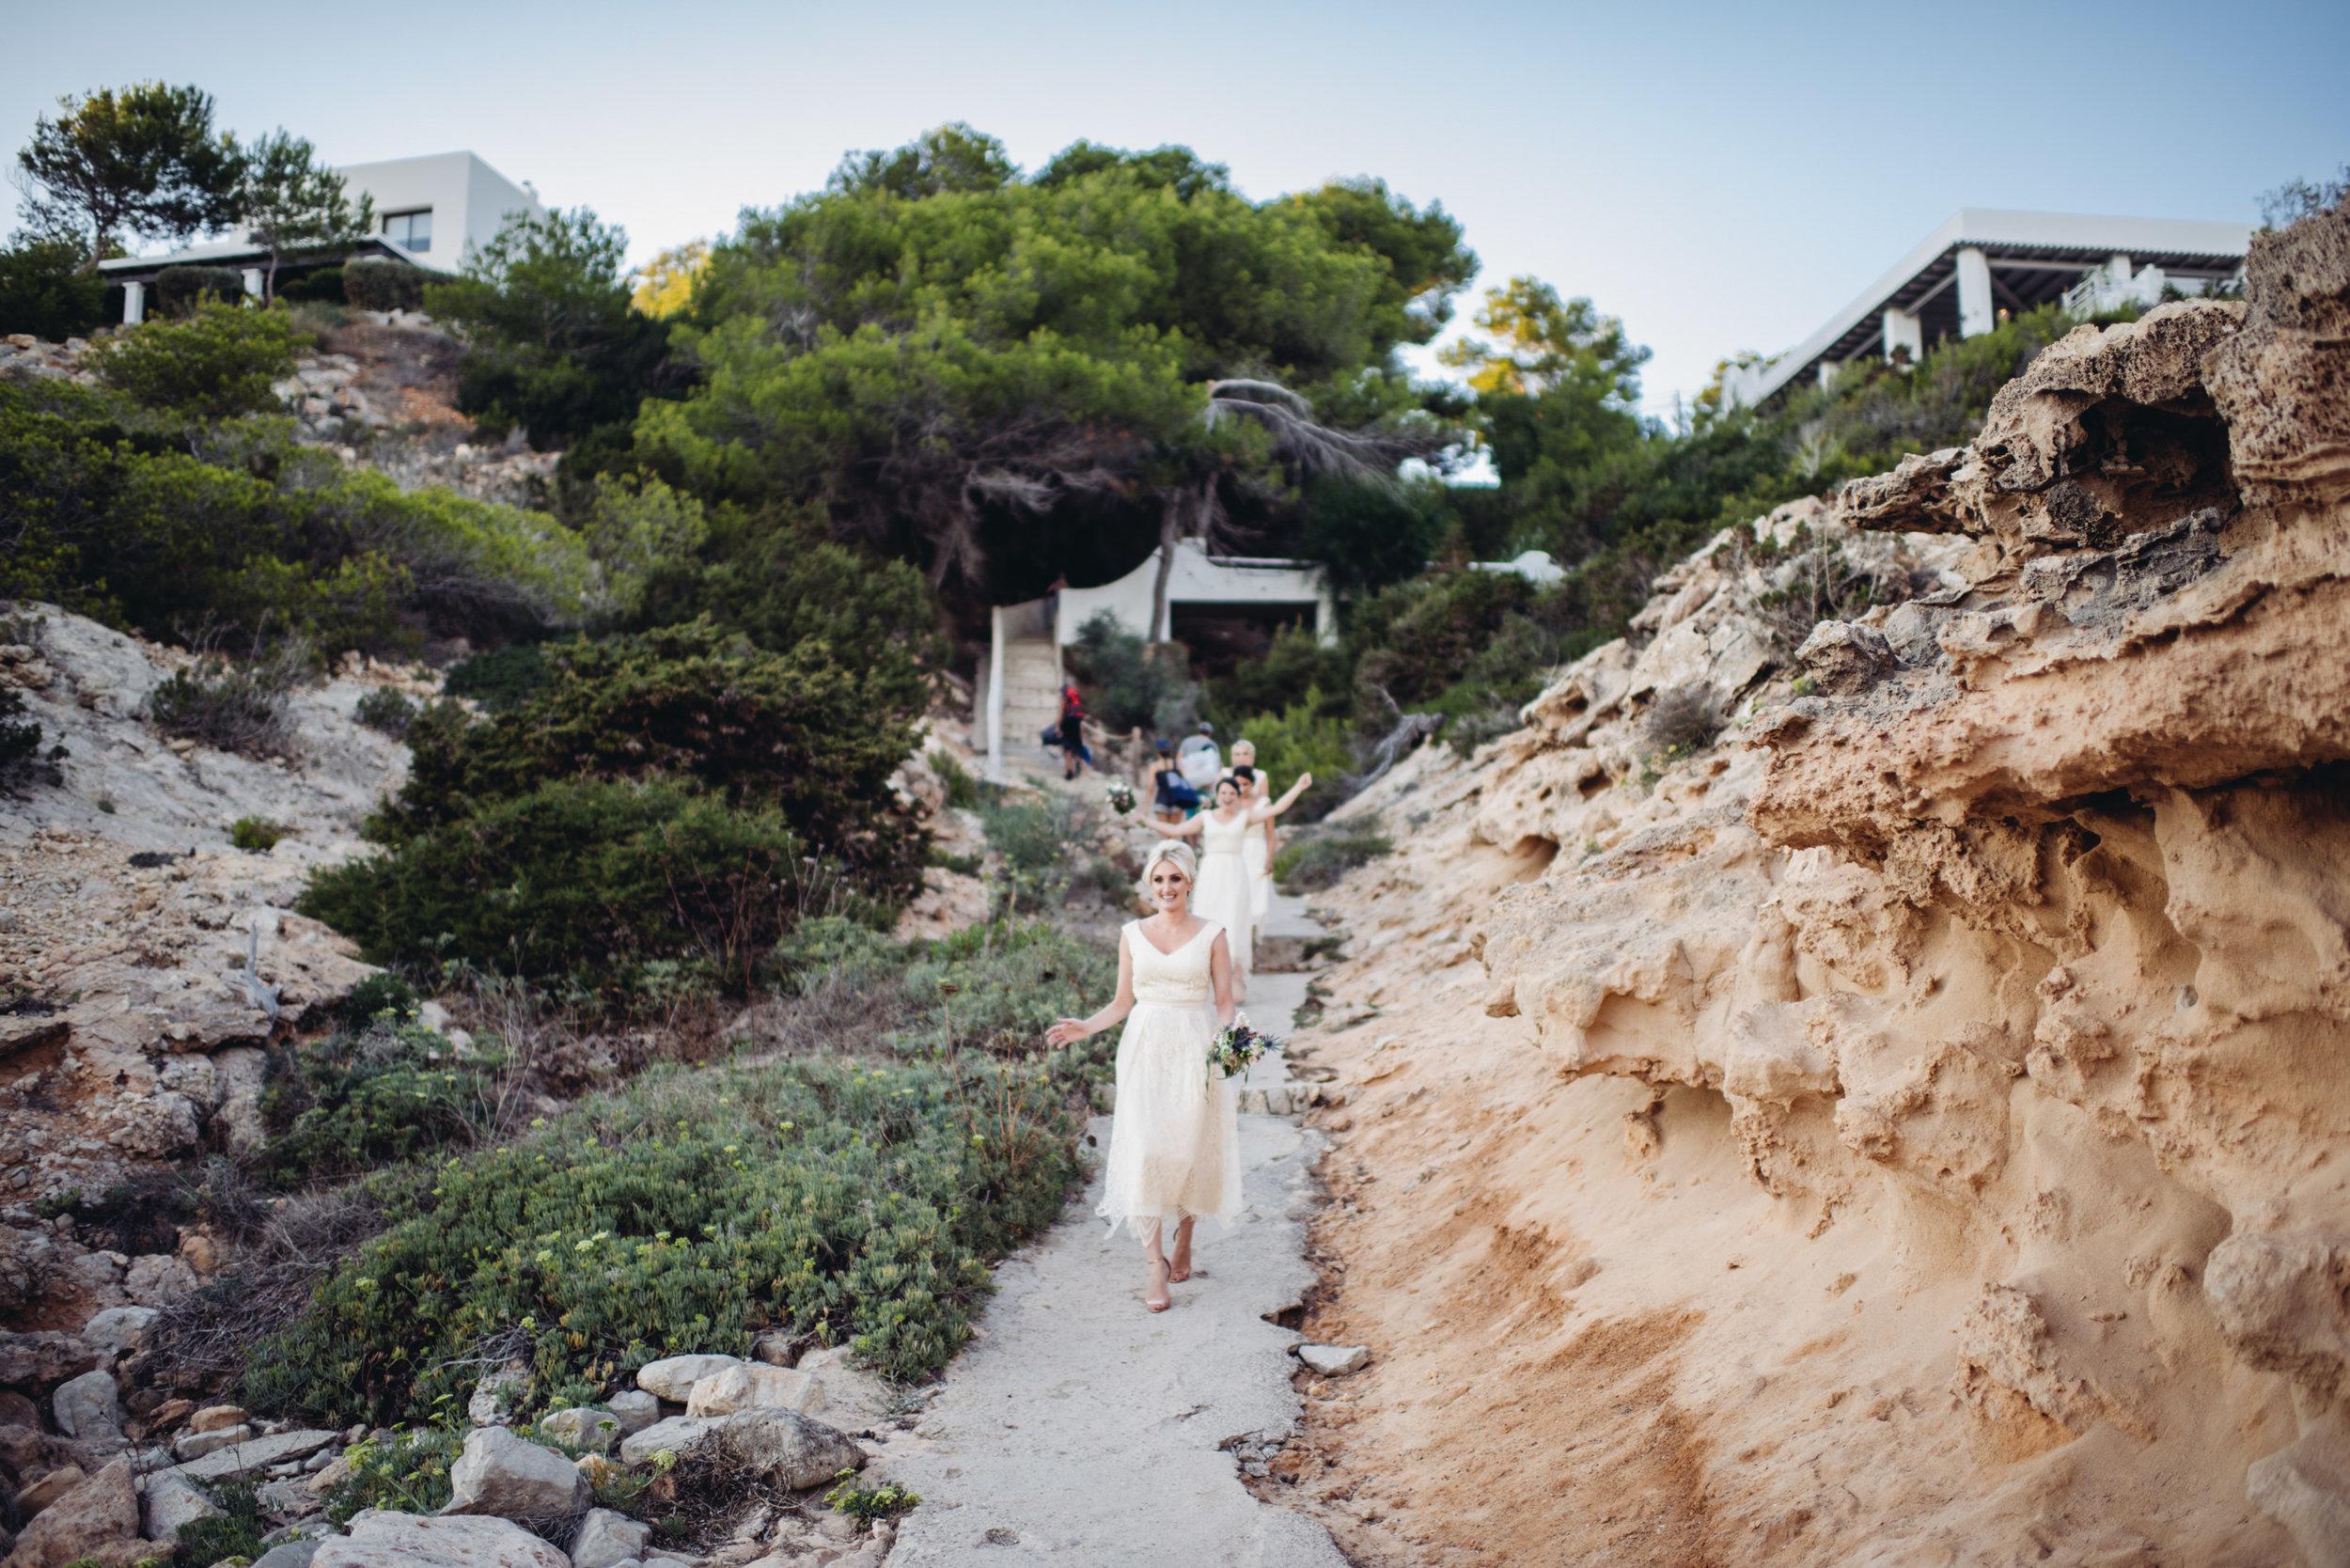 0131-IBIZA-ELIXIR-BEACH-CLUB-WEDDING-PHOTOGRAPHY-ALTERNATIVE-WEDDING-PHOTOGRAPHY.JPG